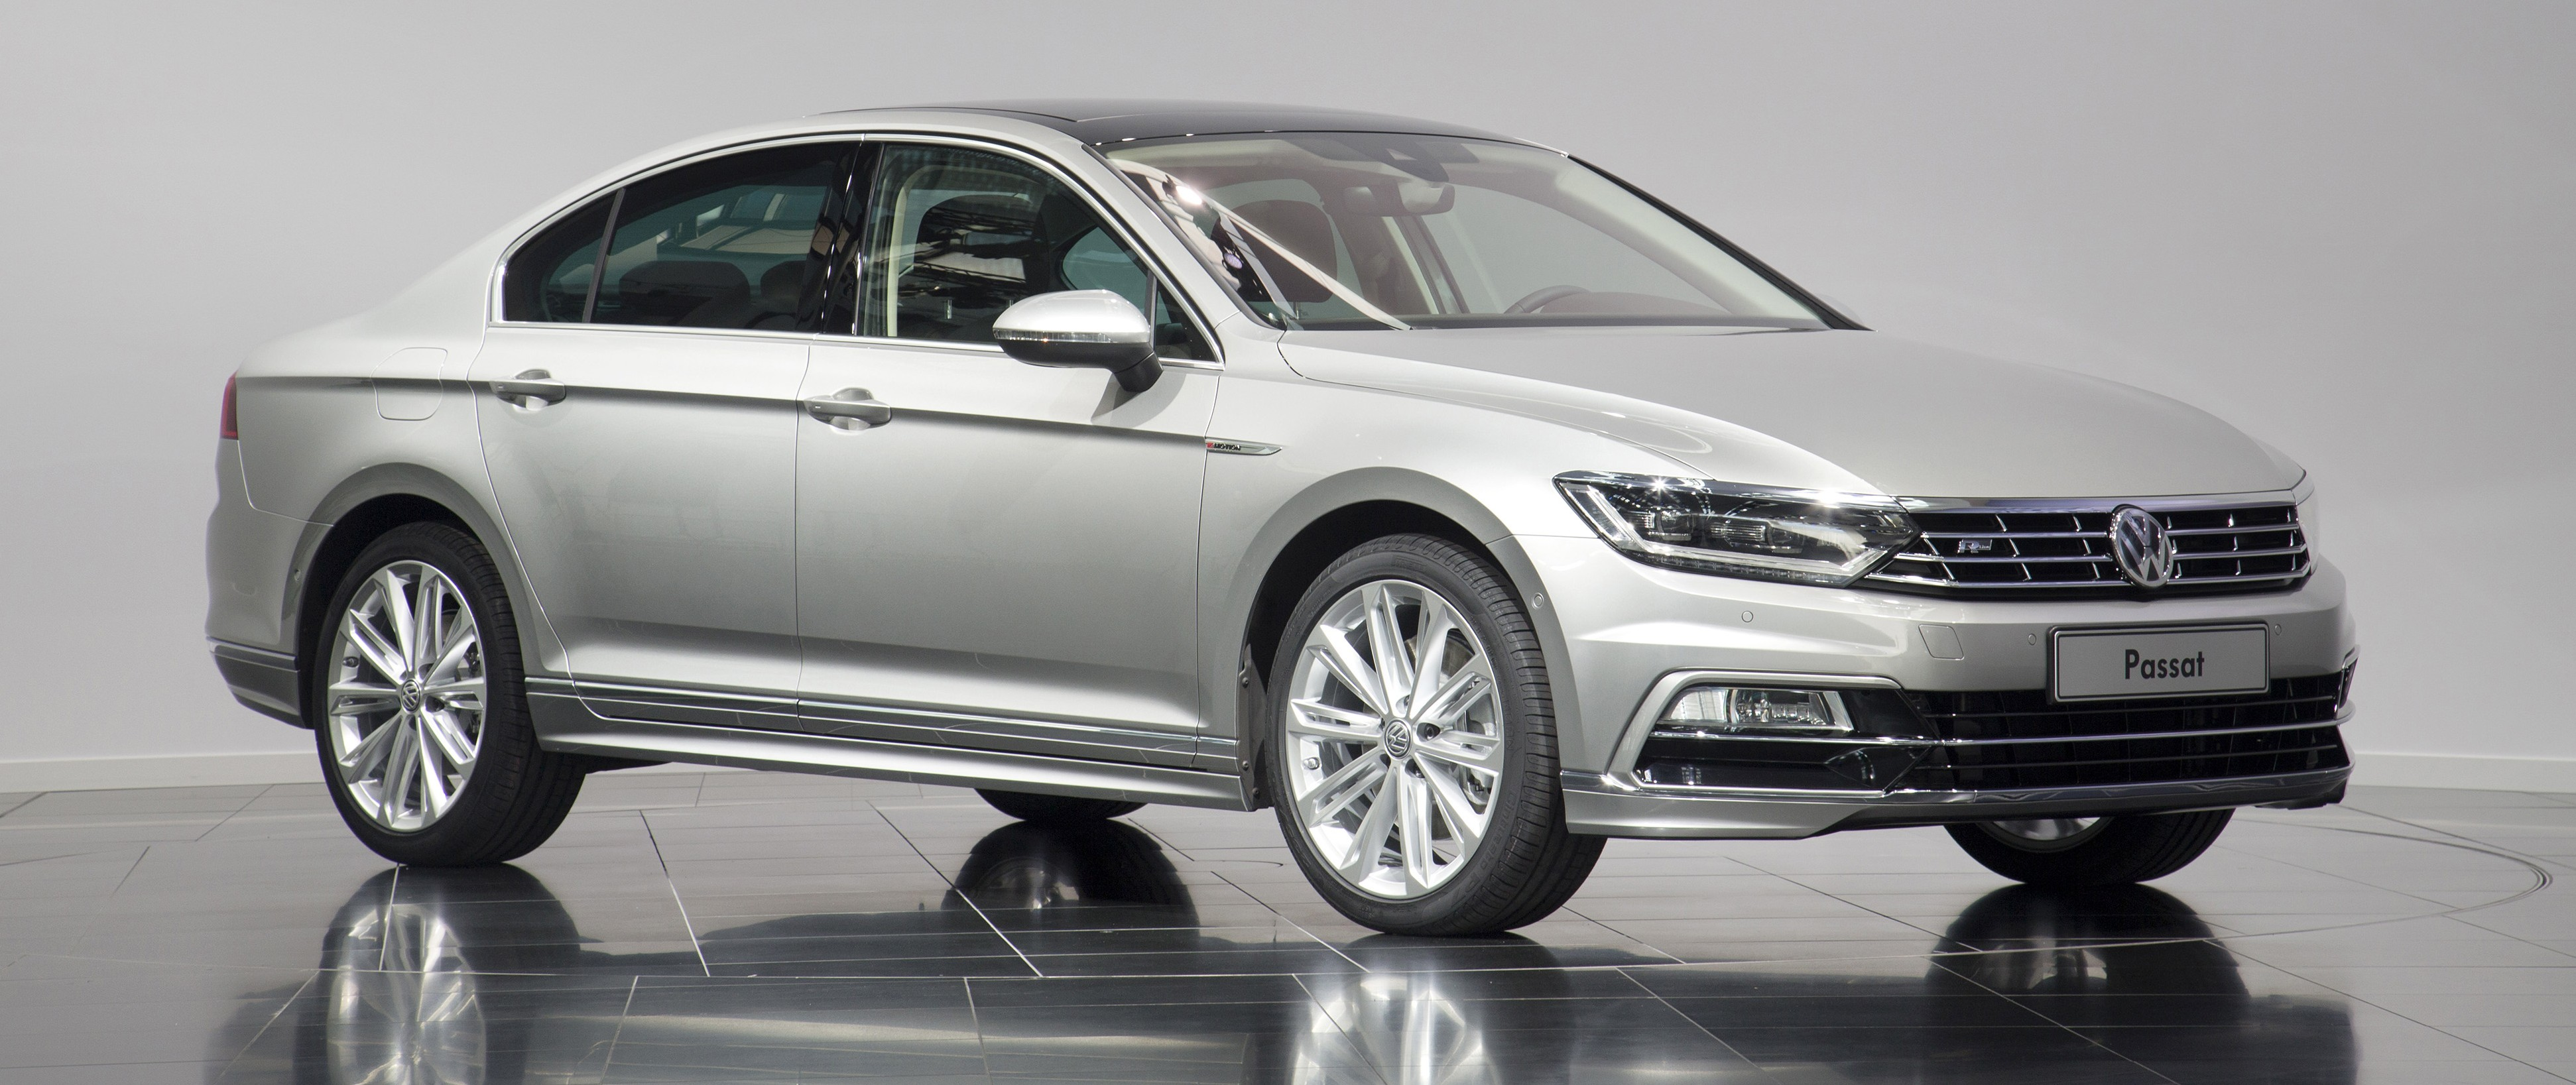 2015 Volkswagen Passat B8 Full Details Amp Photos Image 259168